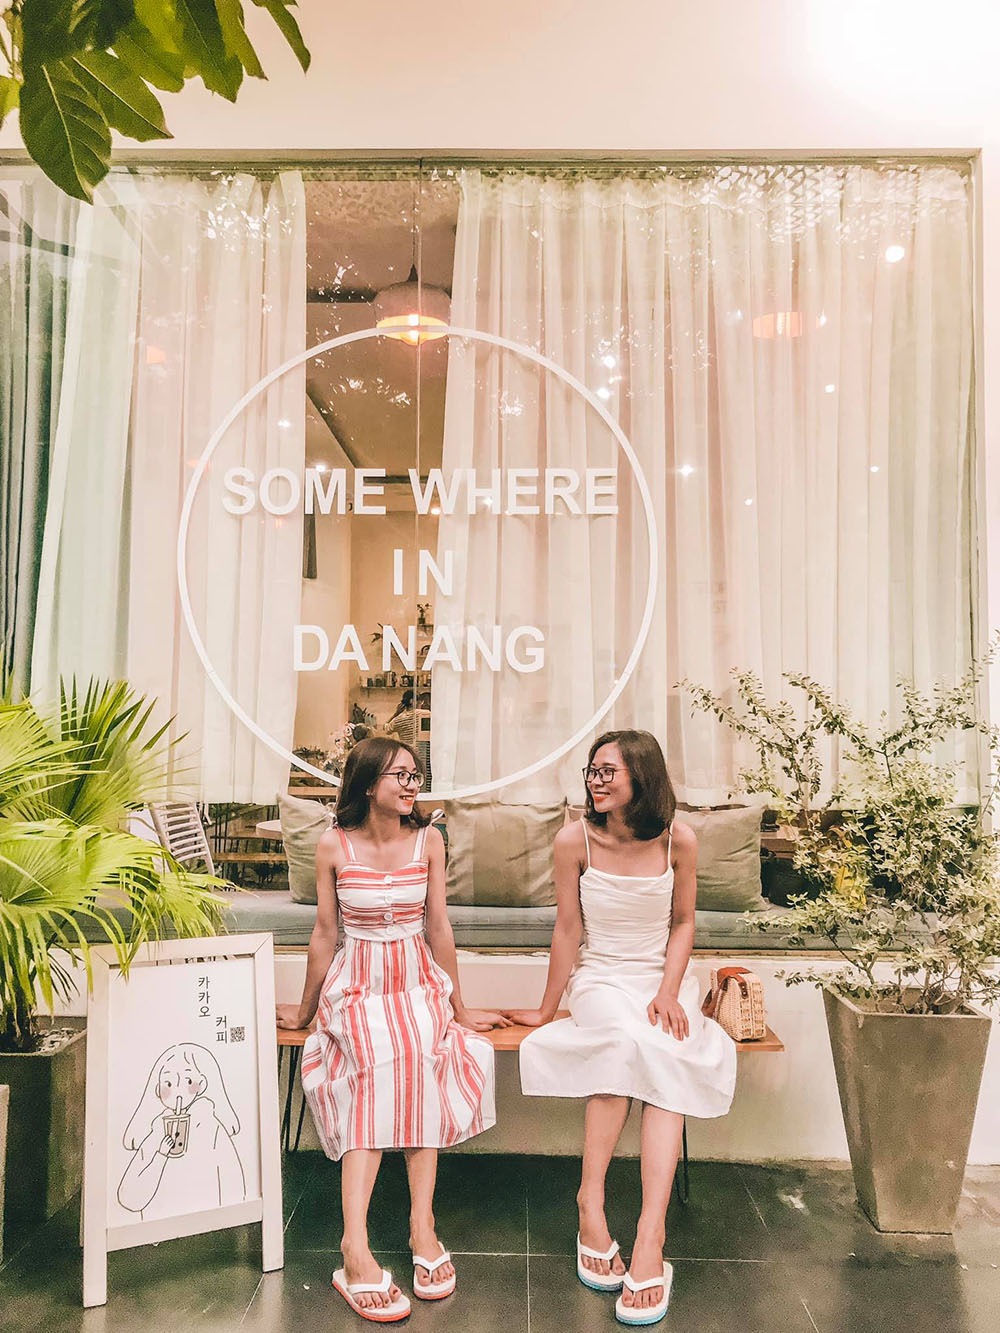 Raon Hotel 97a Hoang Bich Son Review Chuyen Du Lich Hoi An Da Nang Cua 02 Co Ban Than 04